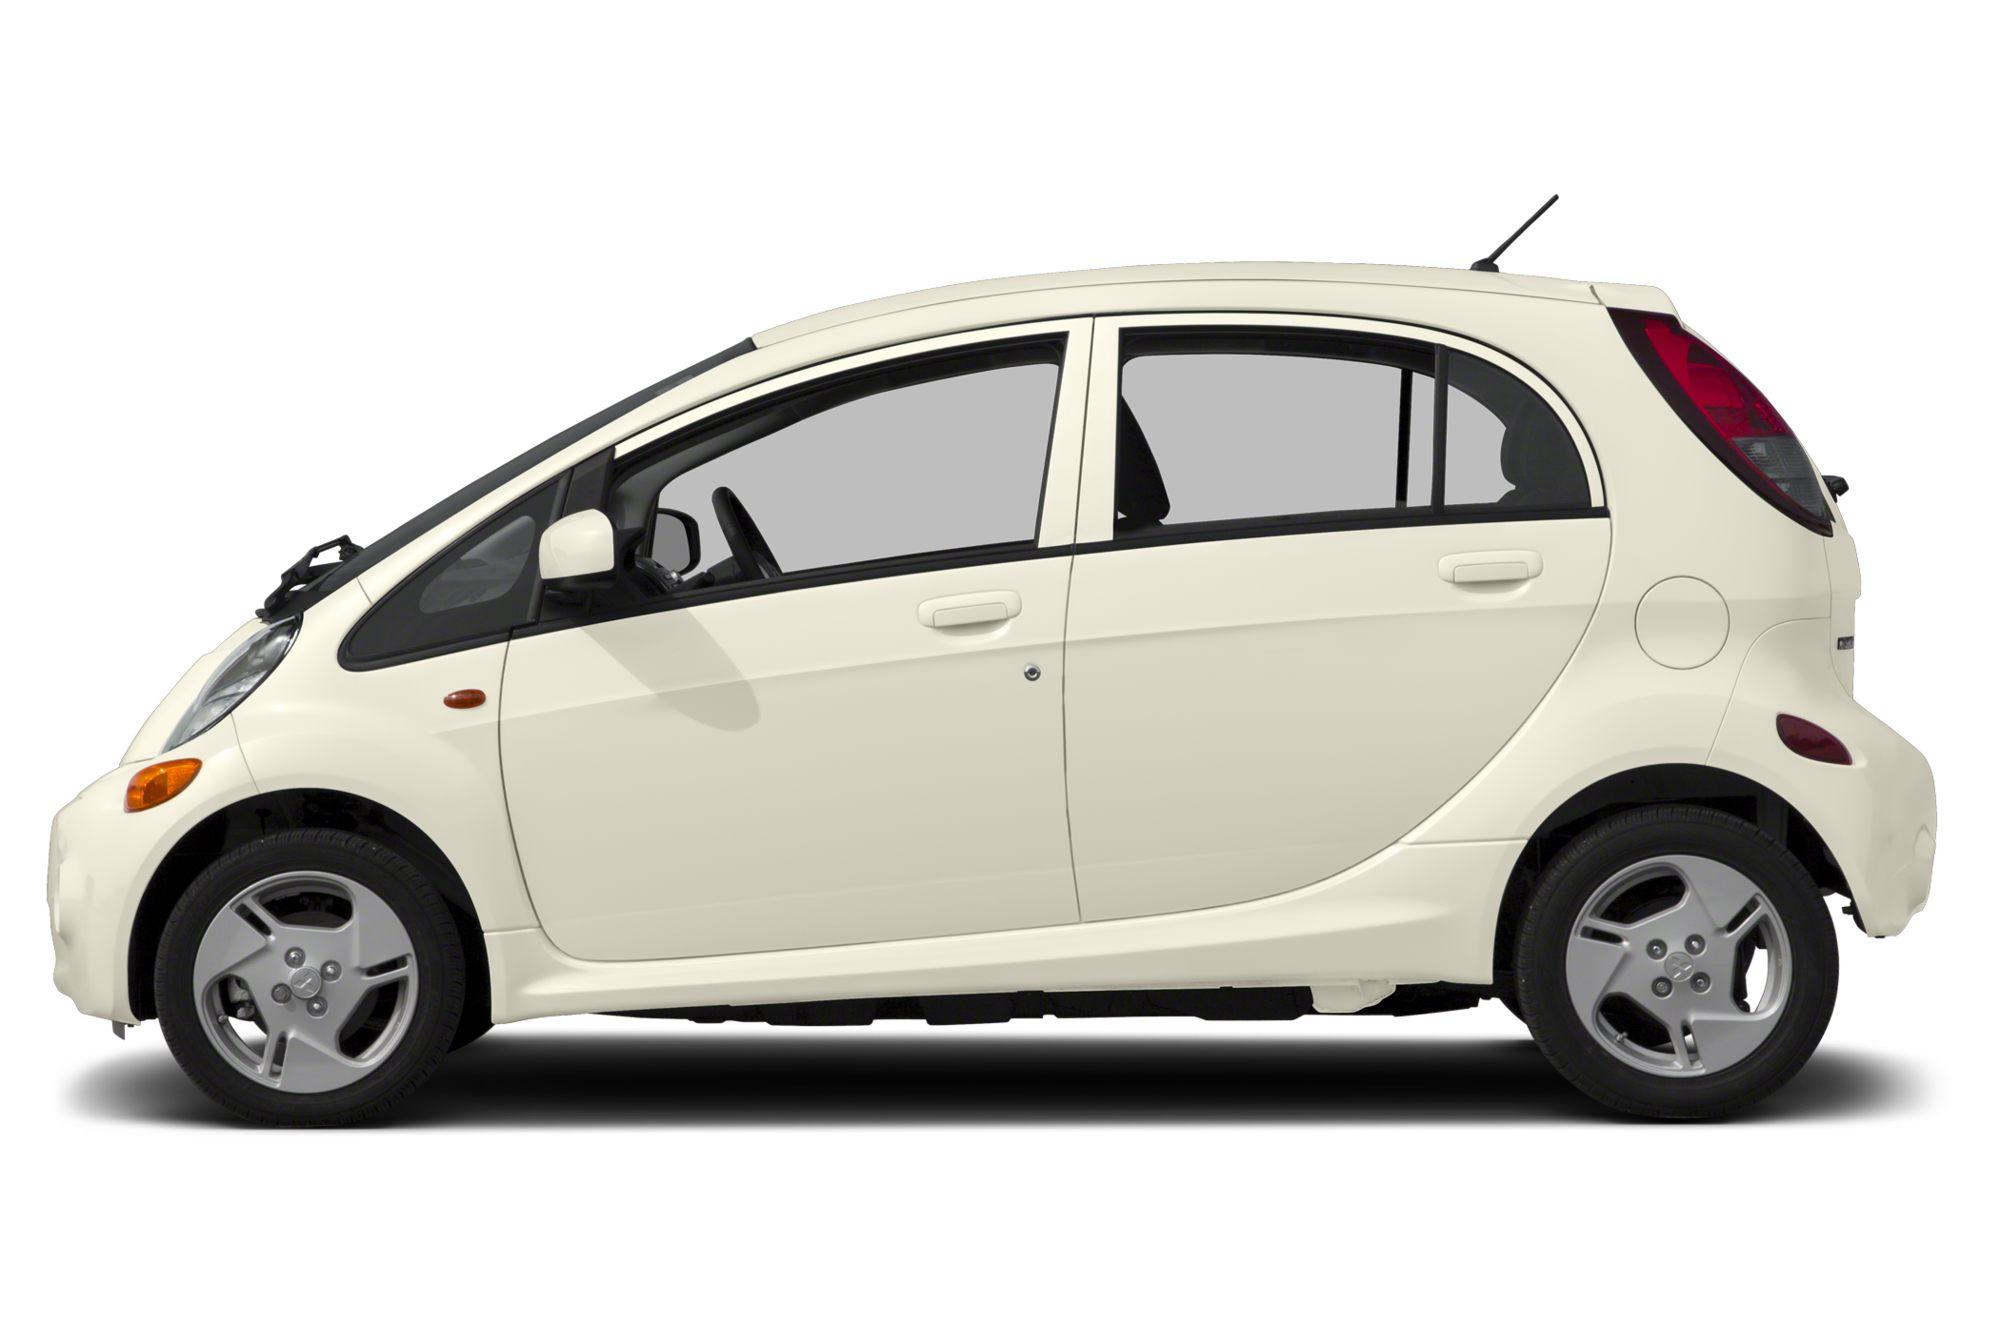 2012-2017 Mitsubishi i-MiEV: Recall Alert